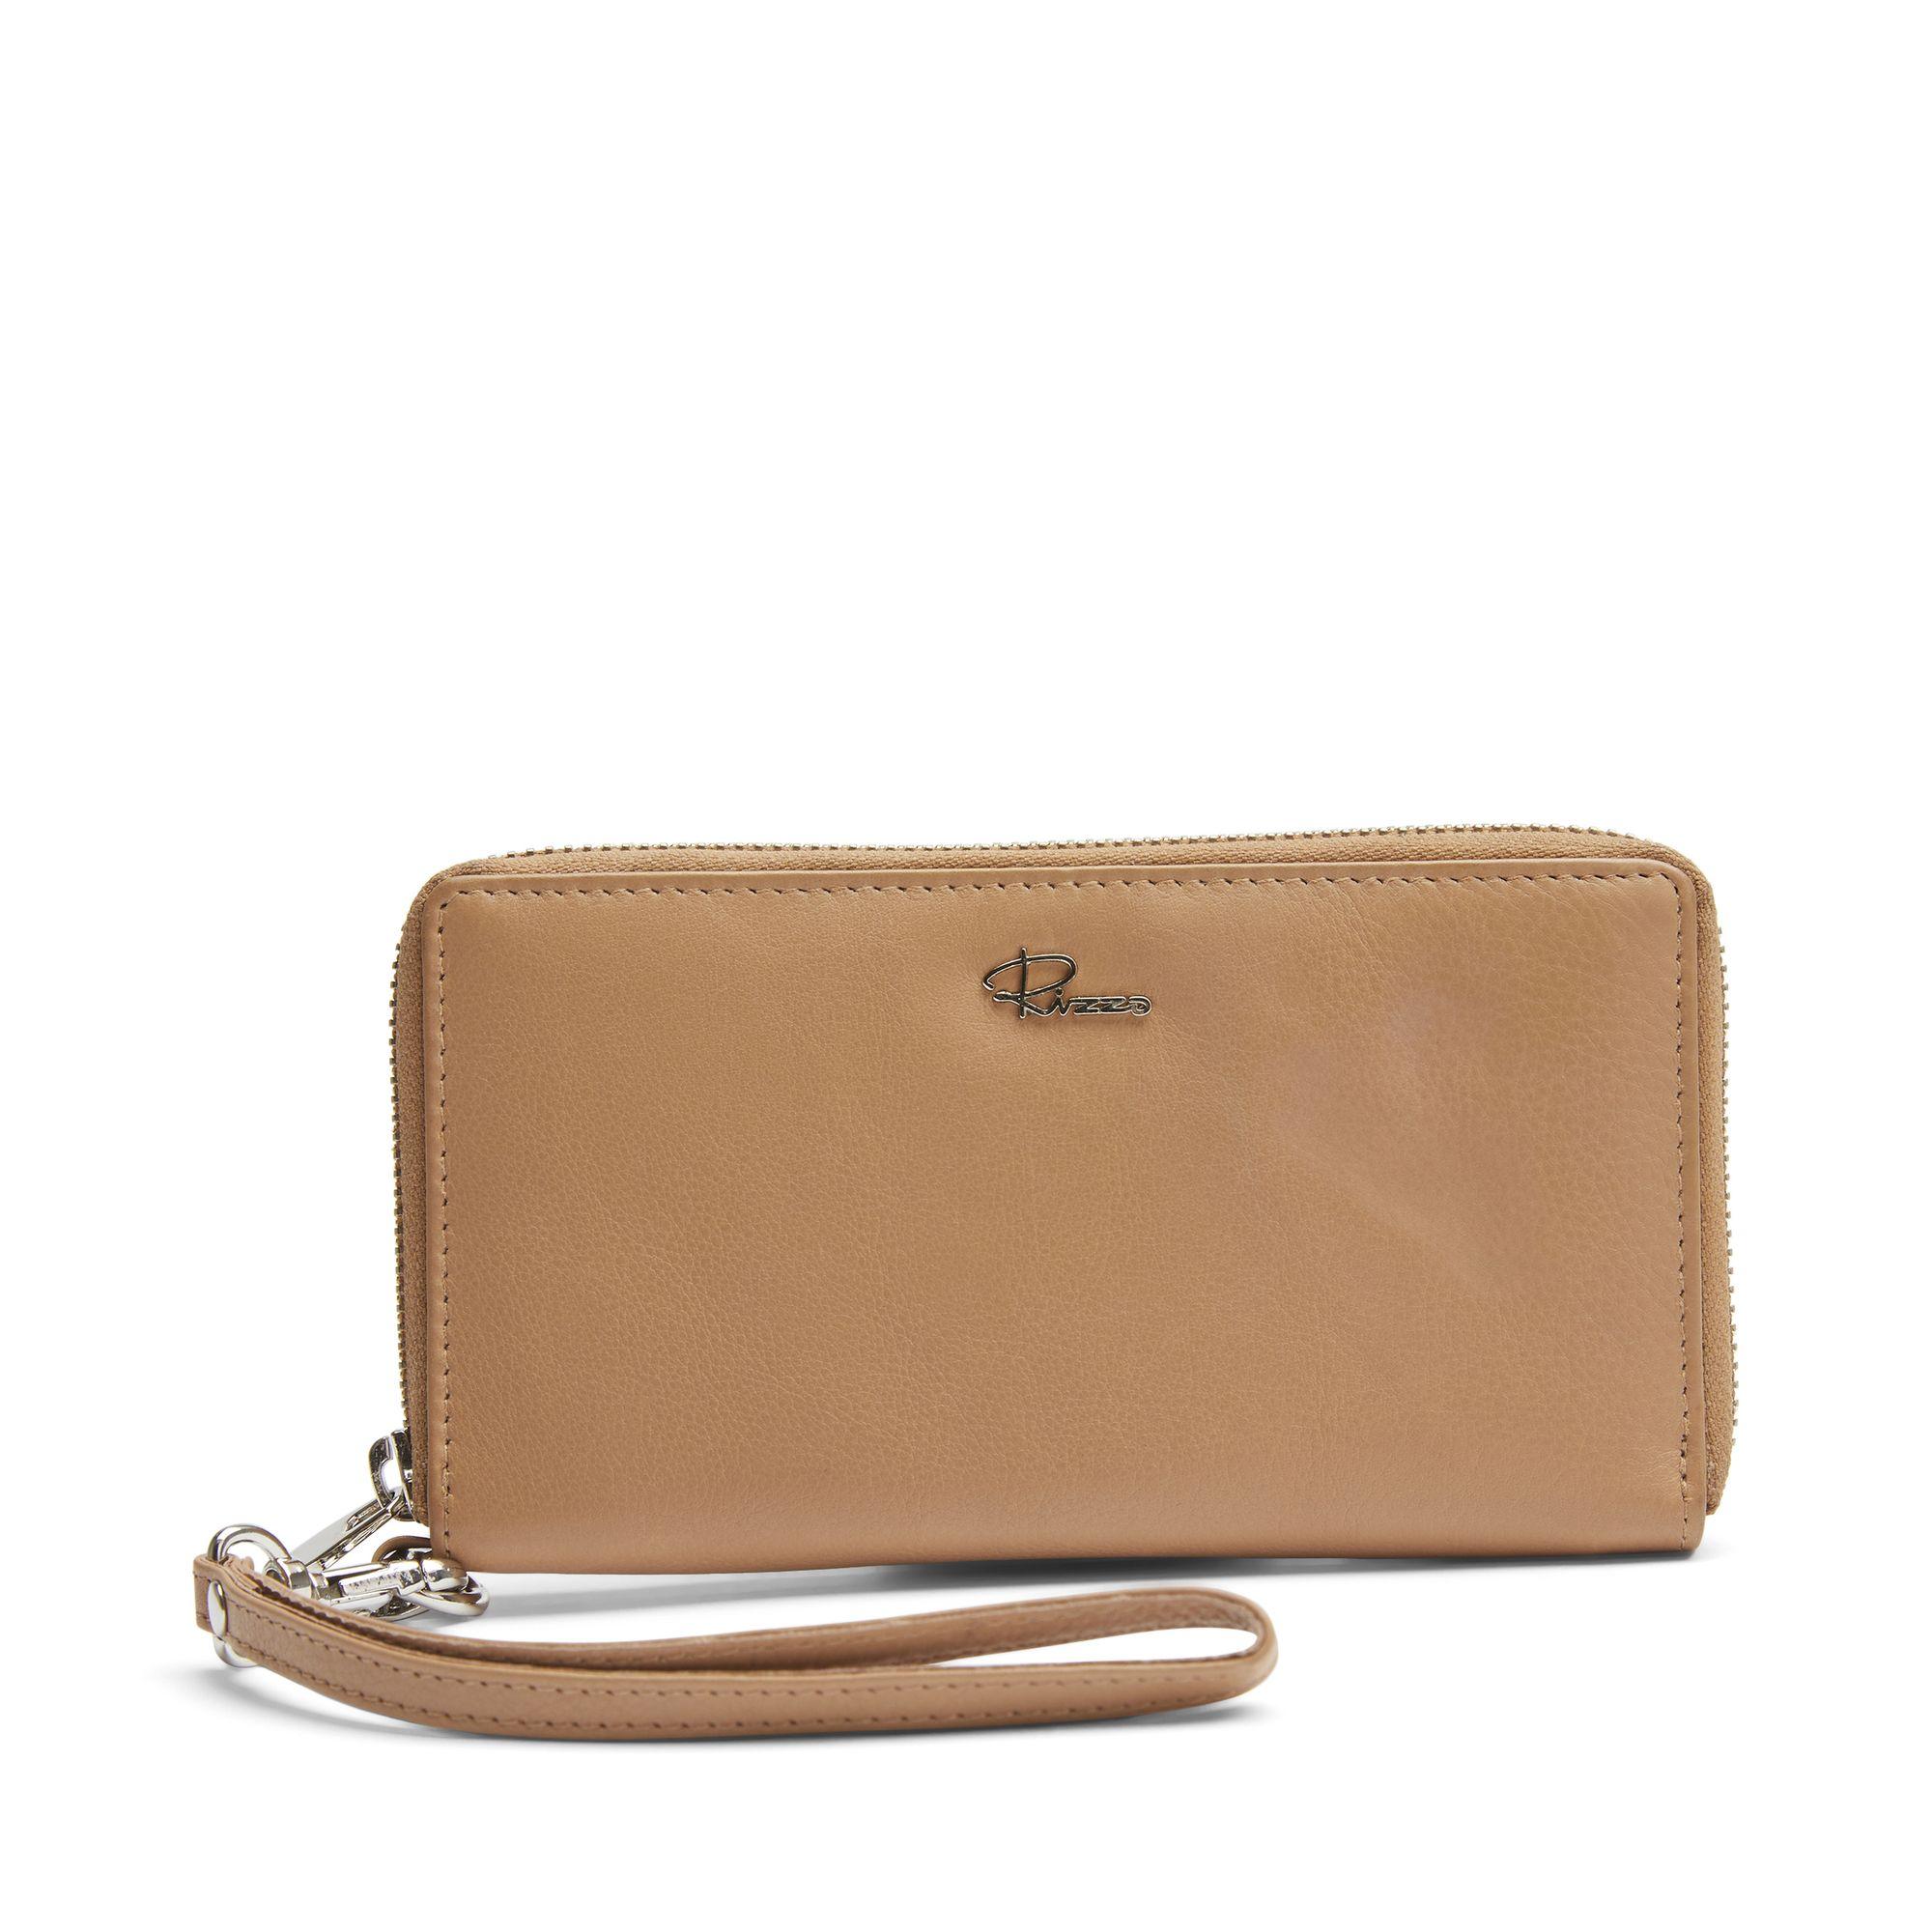 Rizzo Joy Arizona plånbok i skinn, Beige